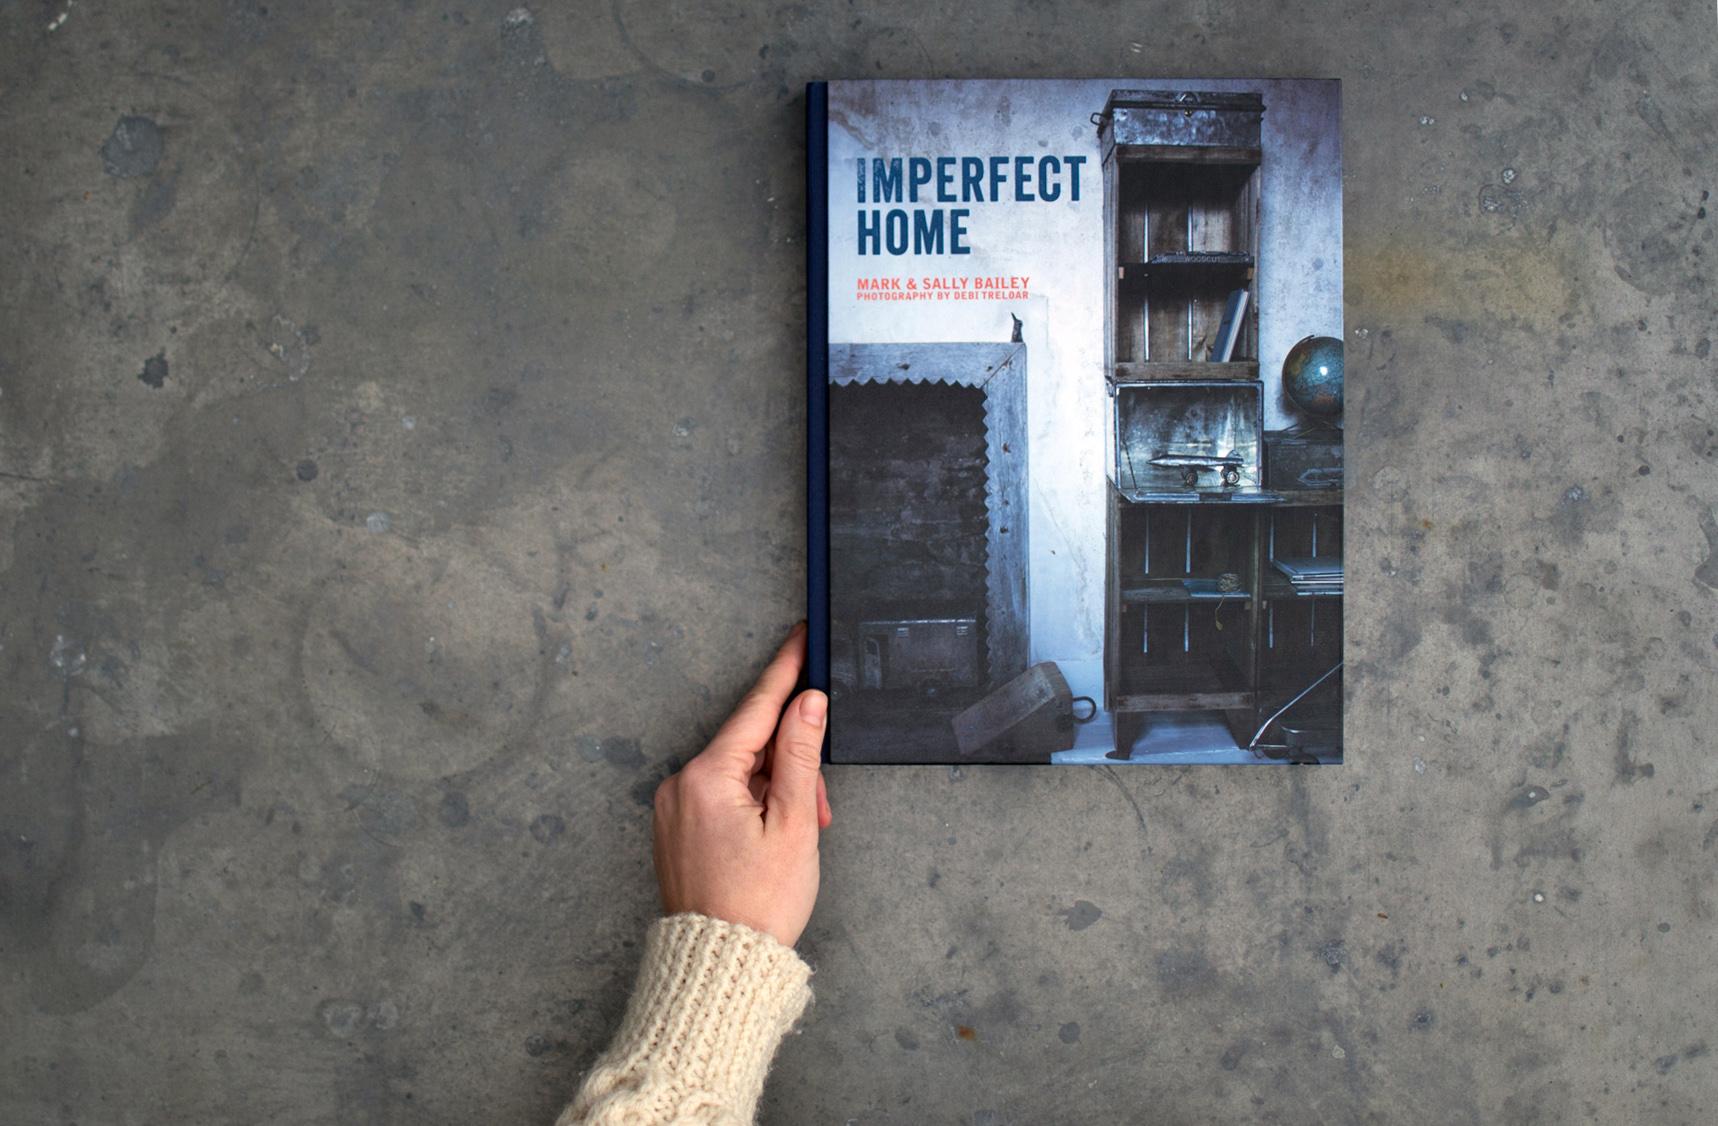 ImperfectHome-04.jpg